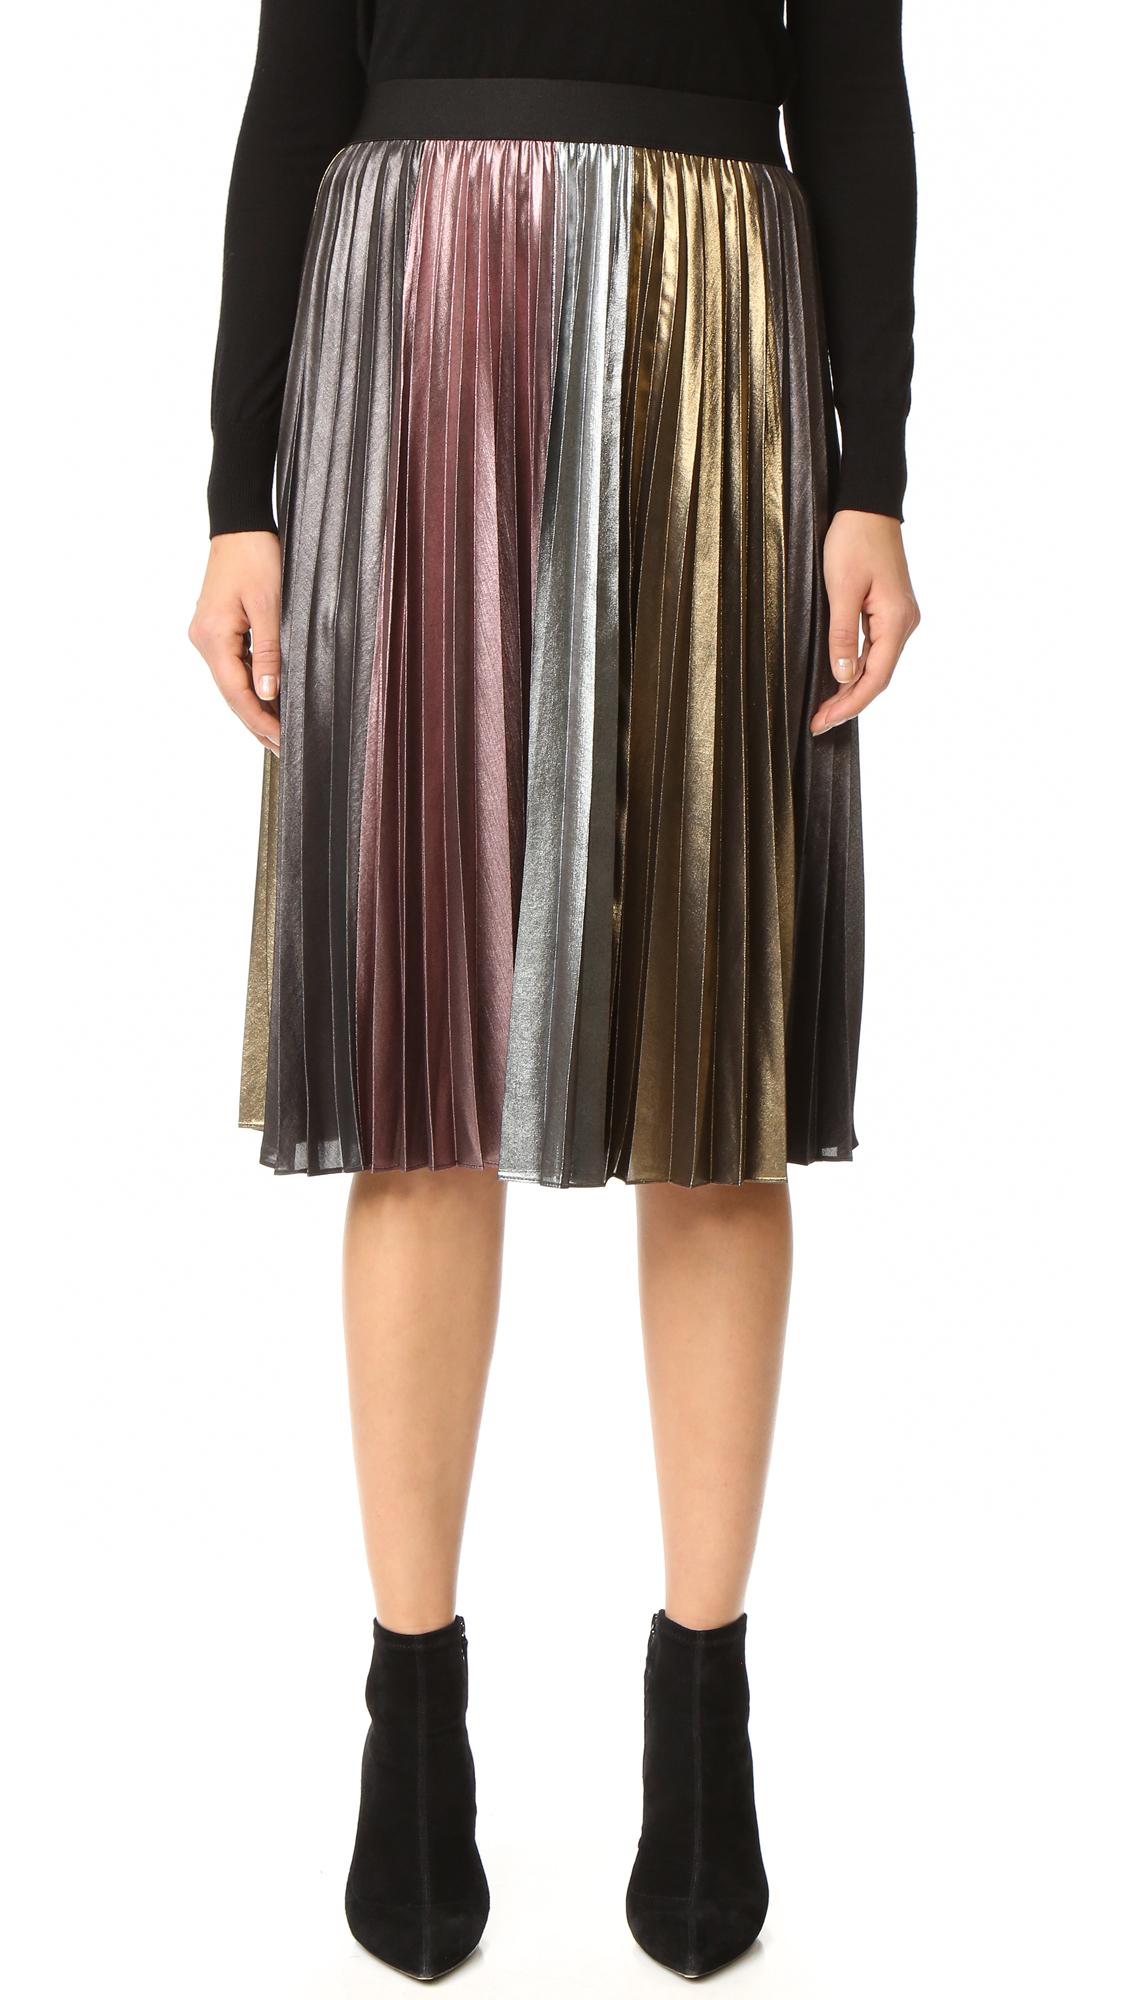 Bcbgmaxazria Metallic Pleated Skirt - Metallic Multi